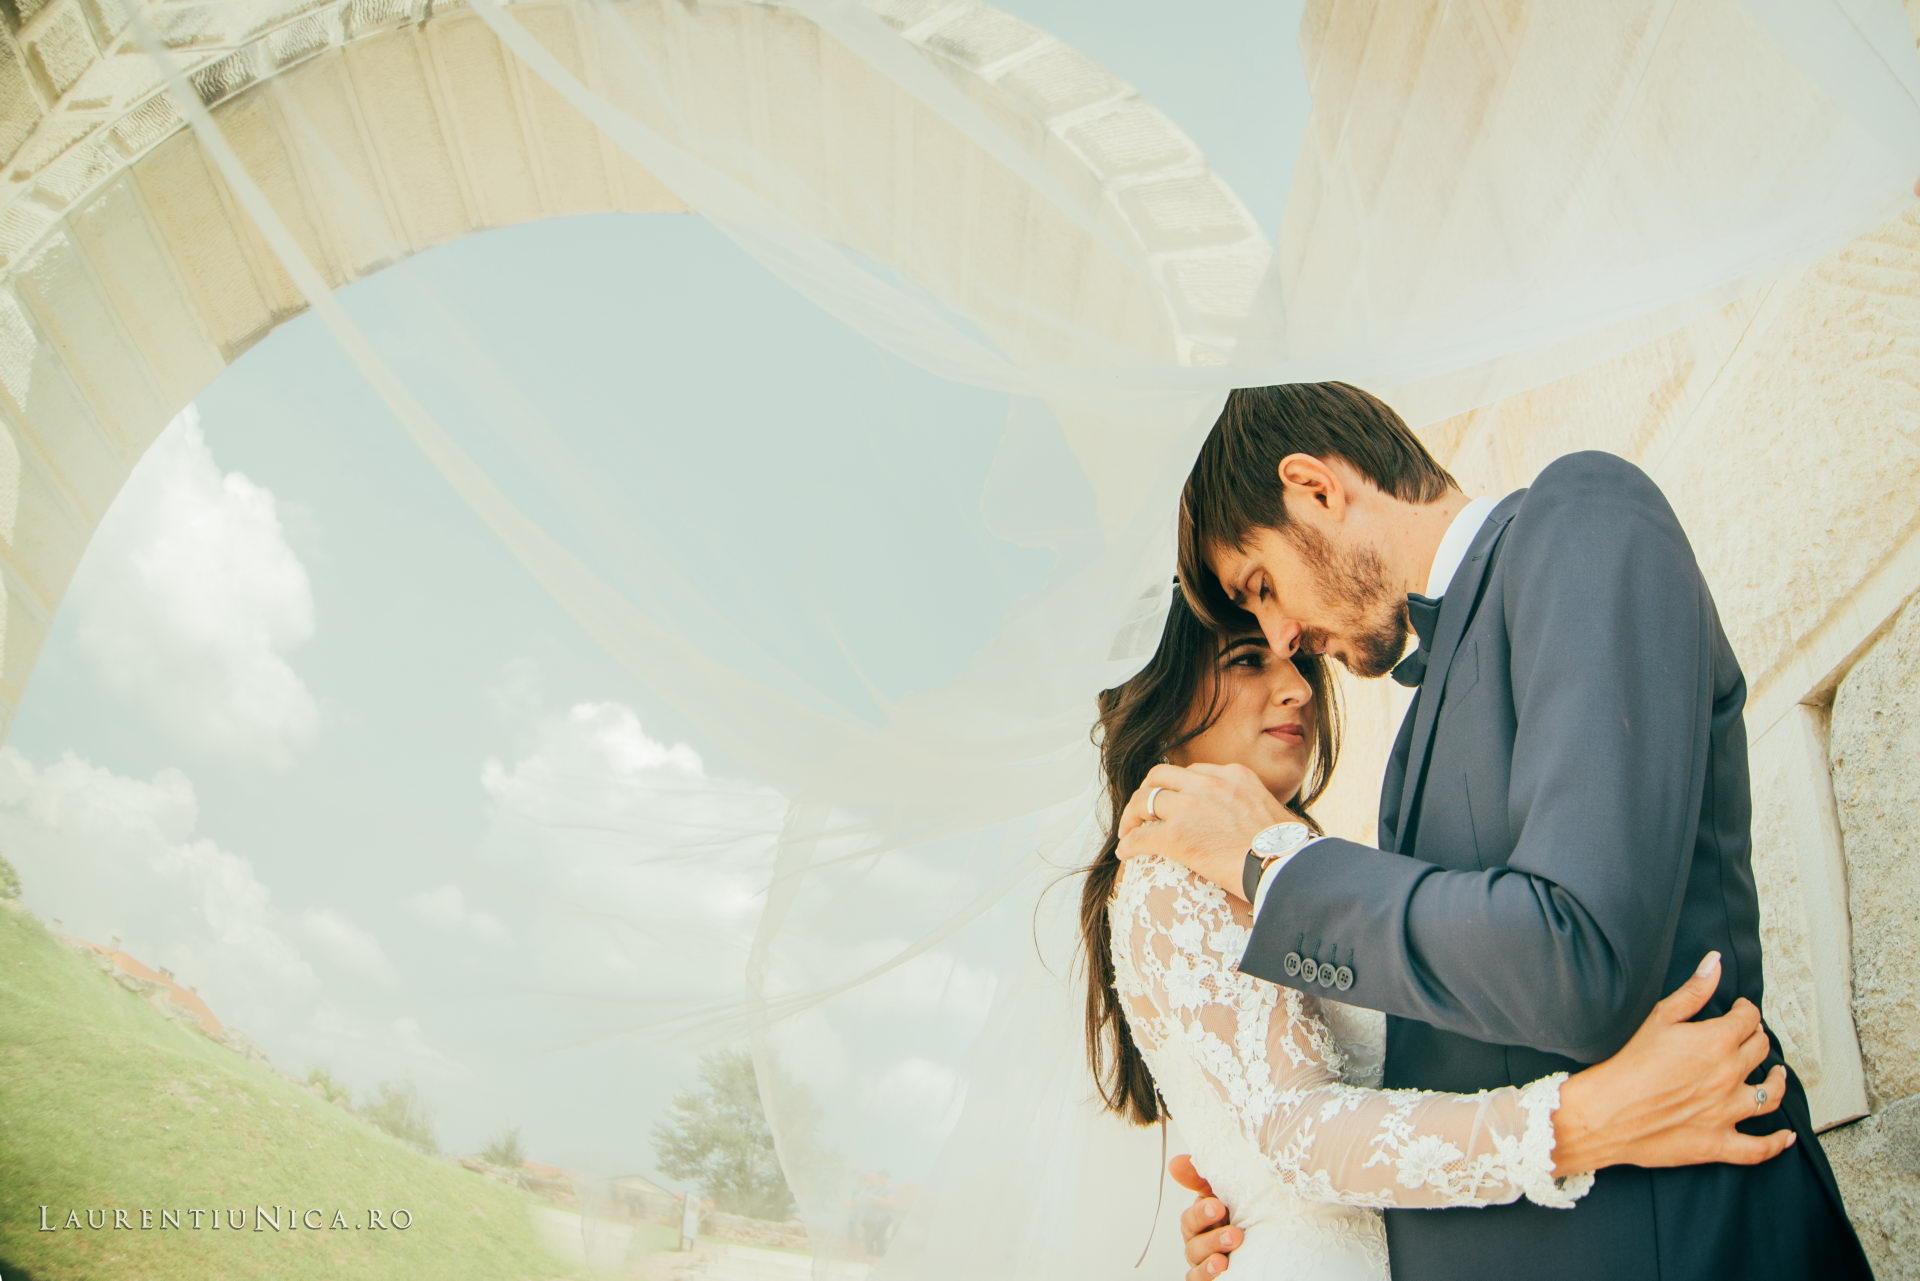 cristina_si_ovidiu-after-wedding-alba-iulia_fotograf_laurentiu_nica_11